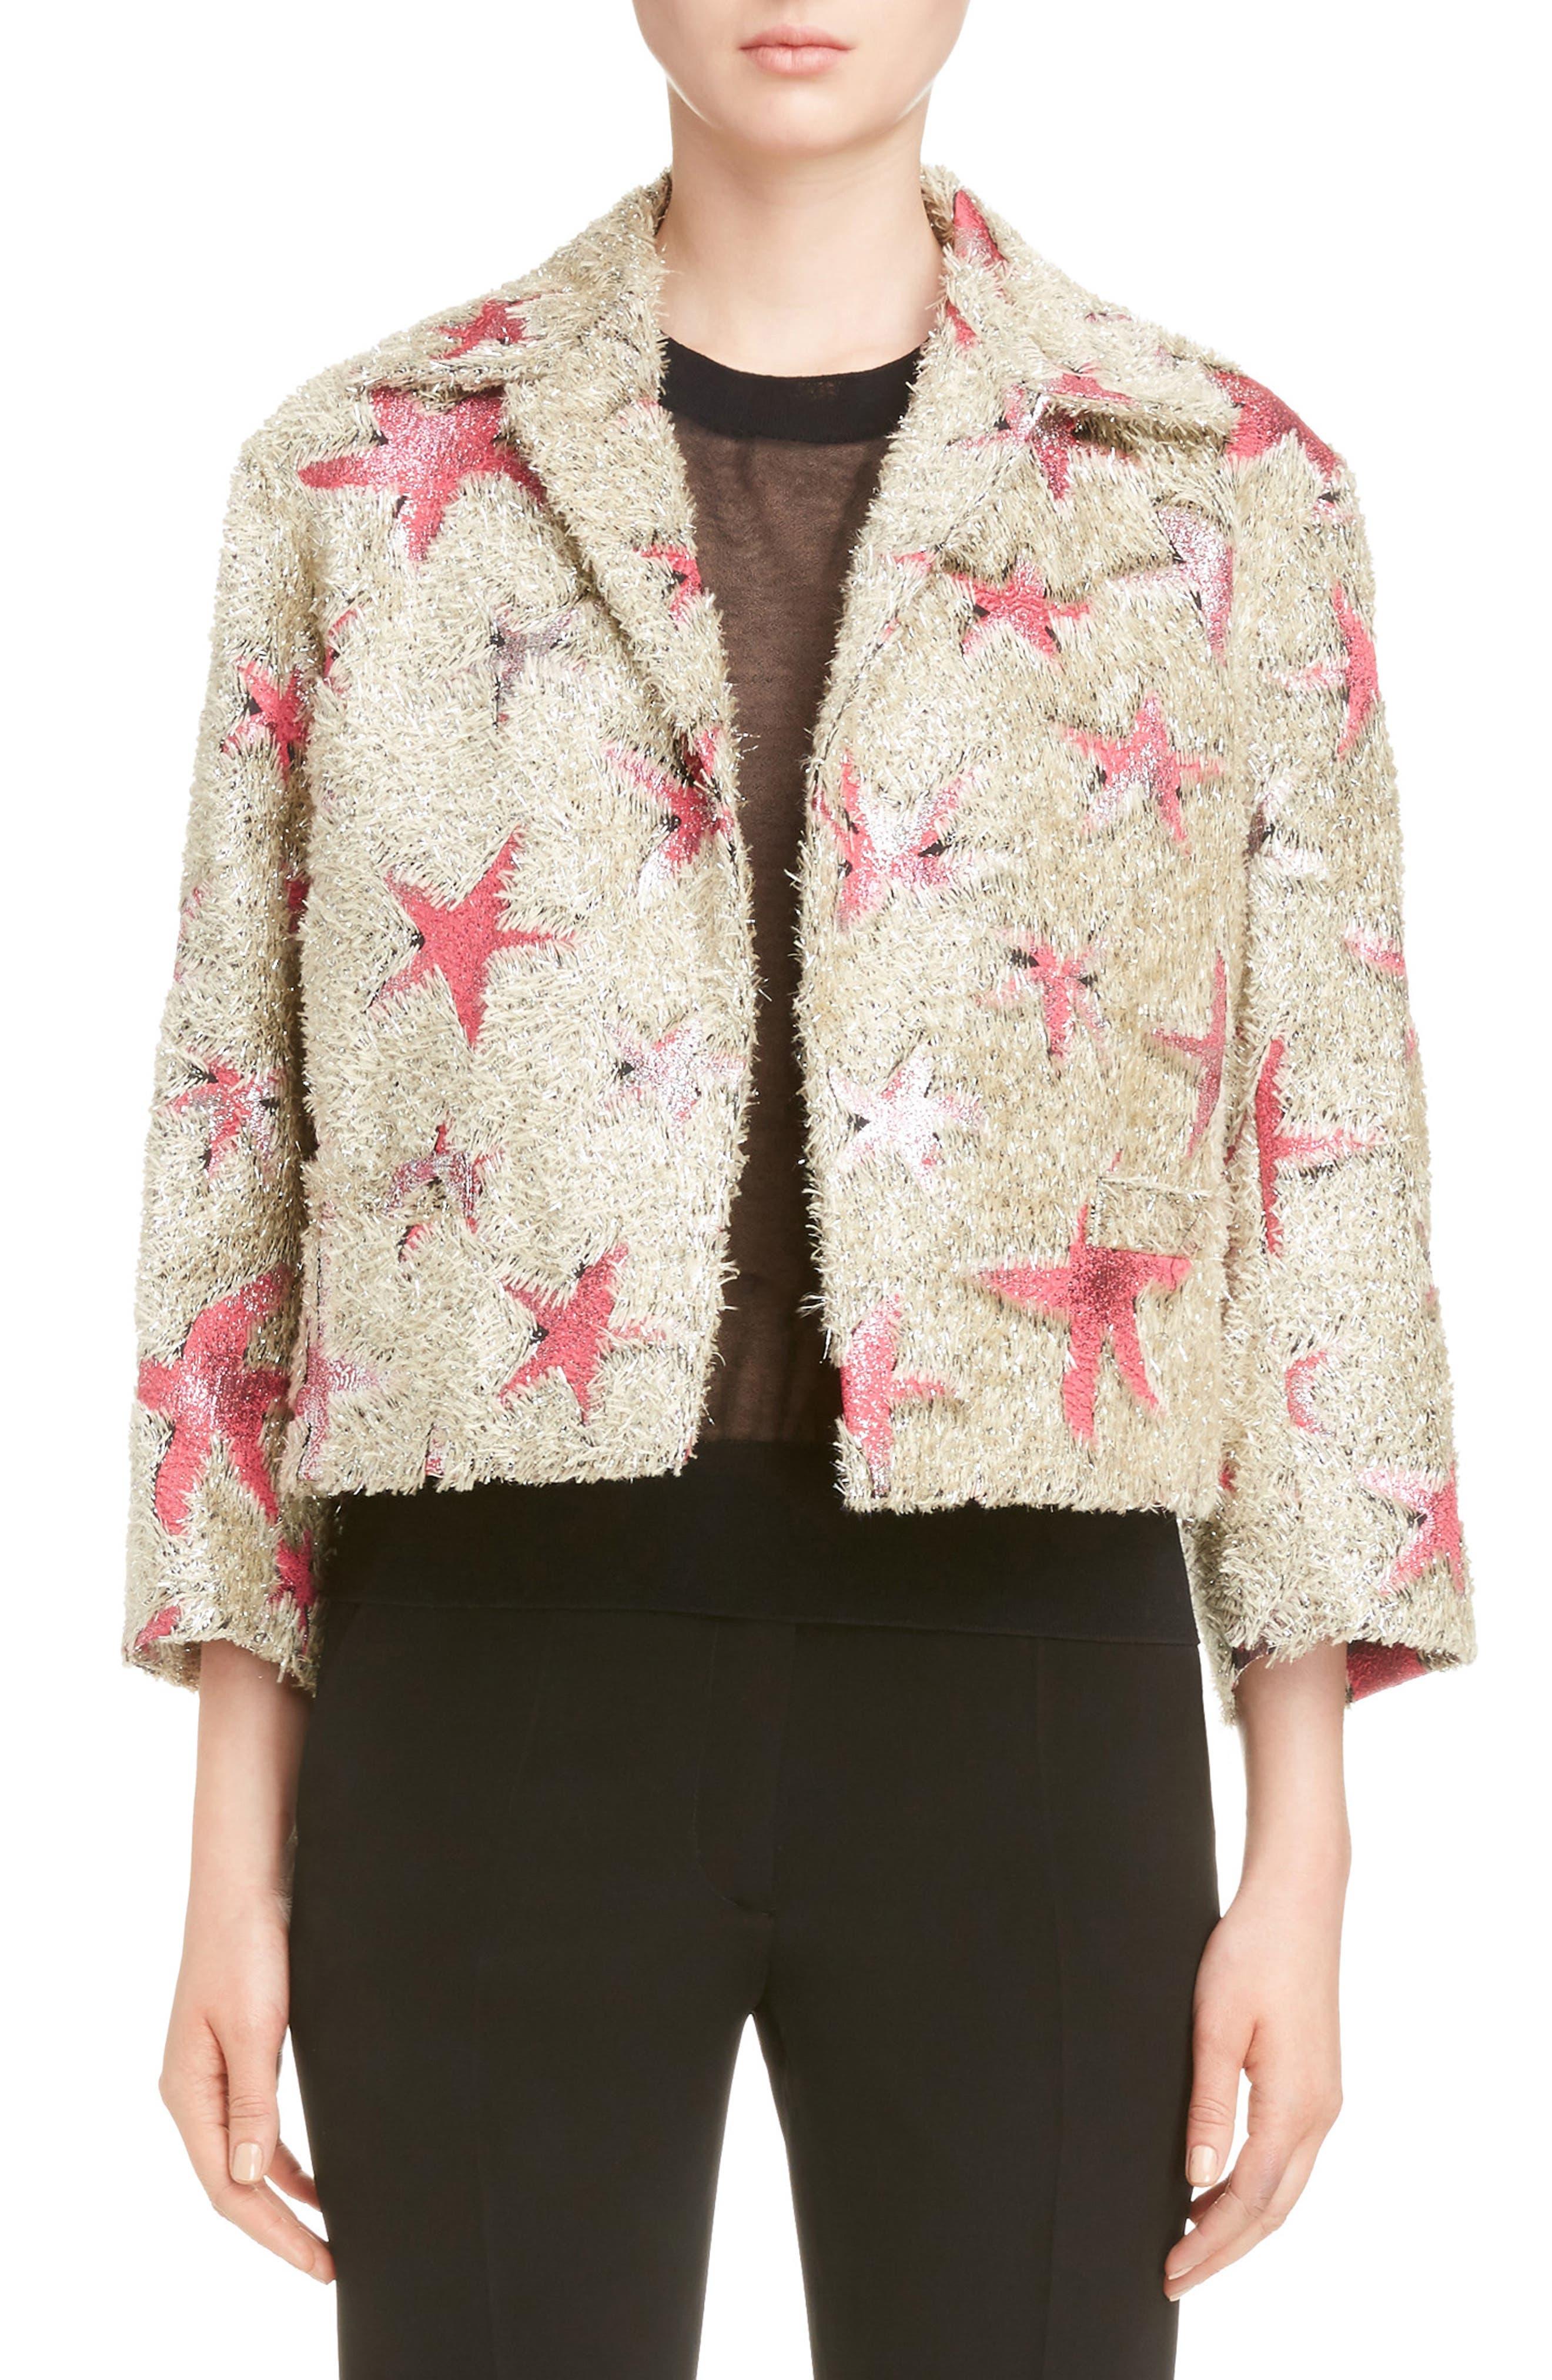 Starfish Shaggy Crop Jacket,                         Main,                         color, Sand